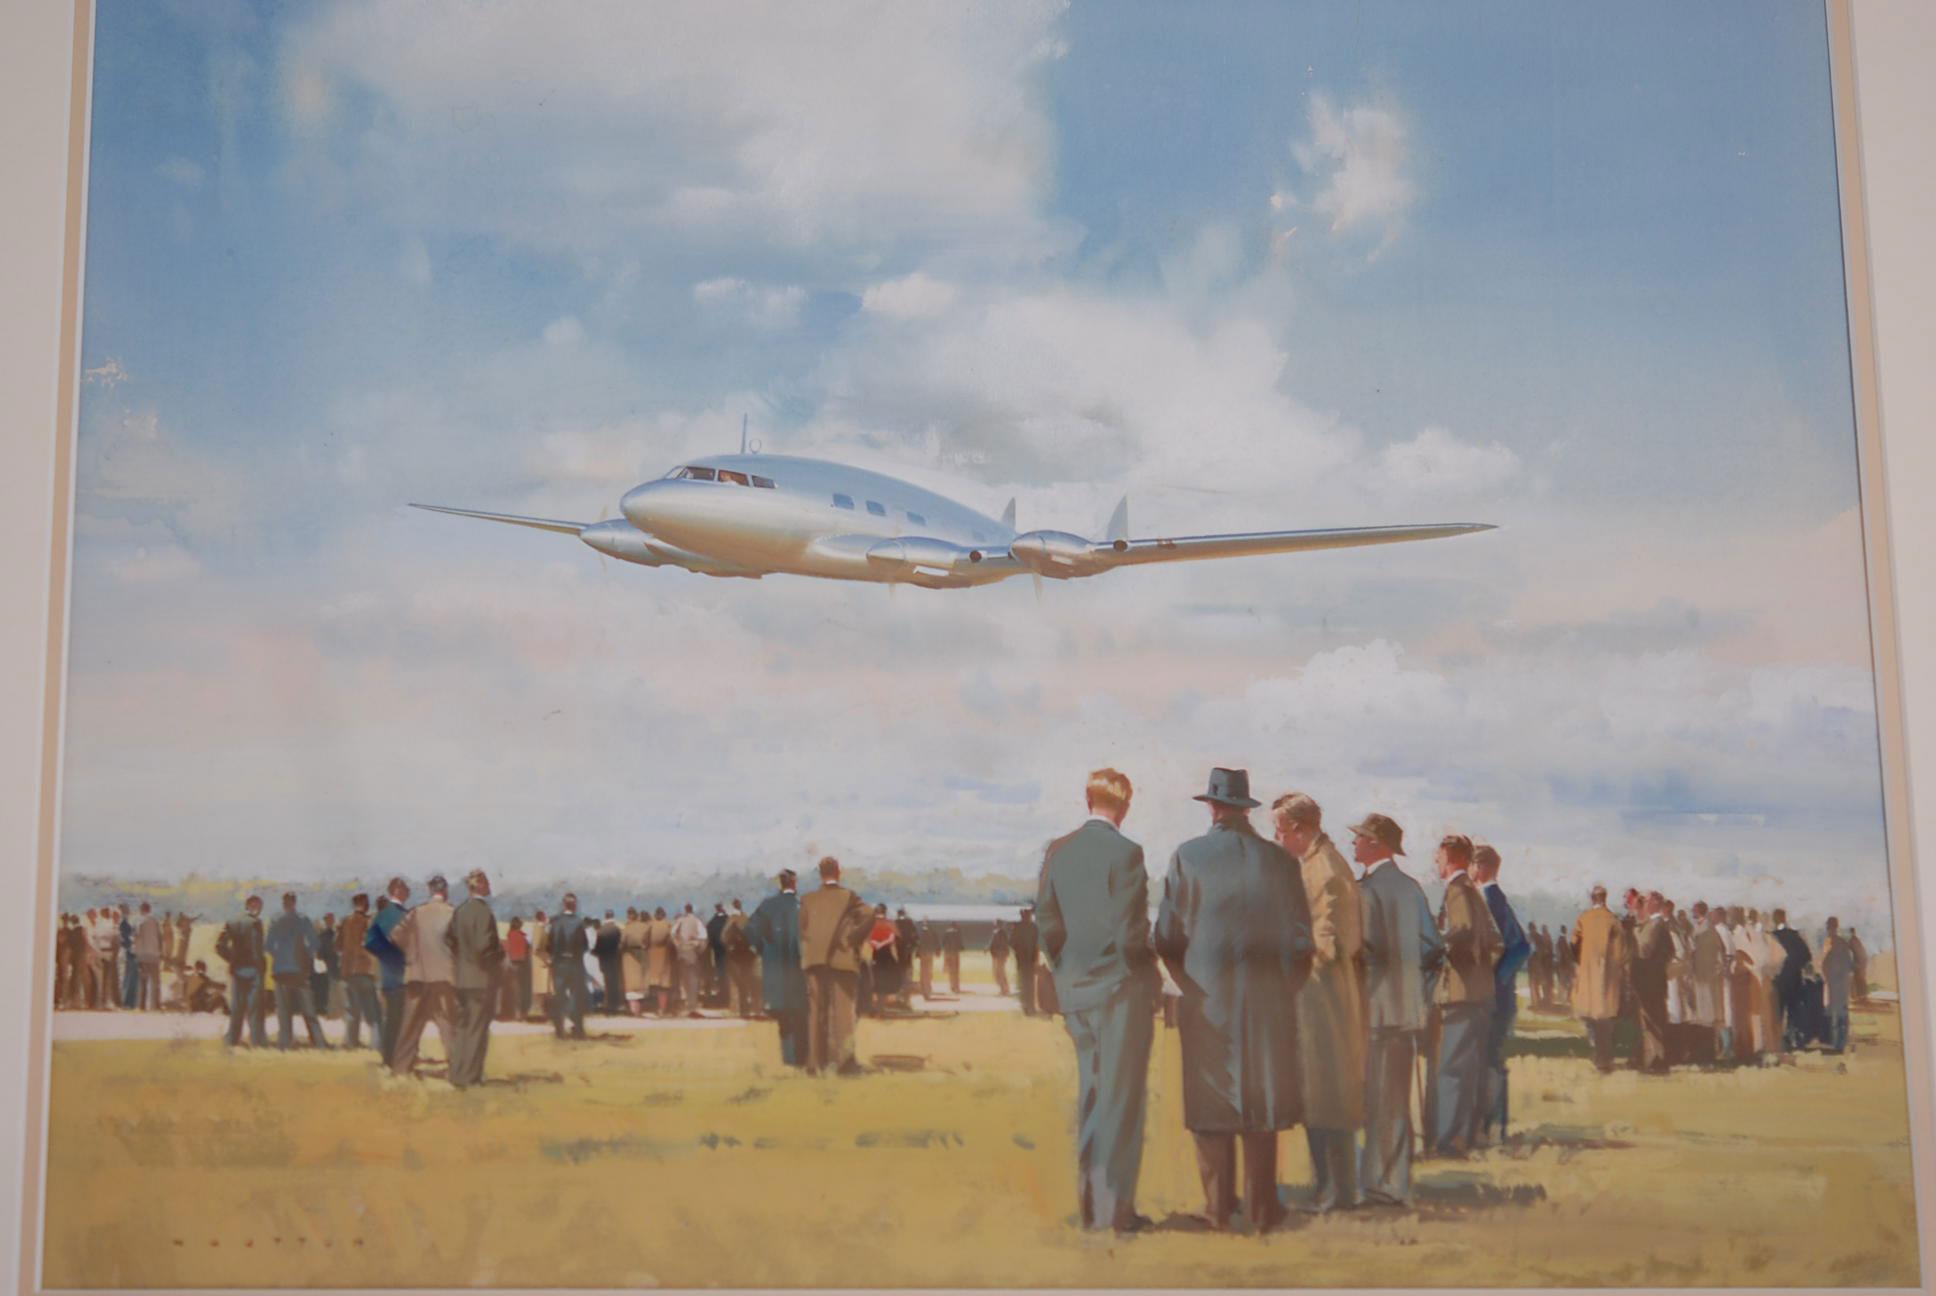 Gouach on board by Frank Wootton